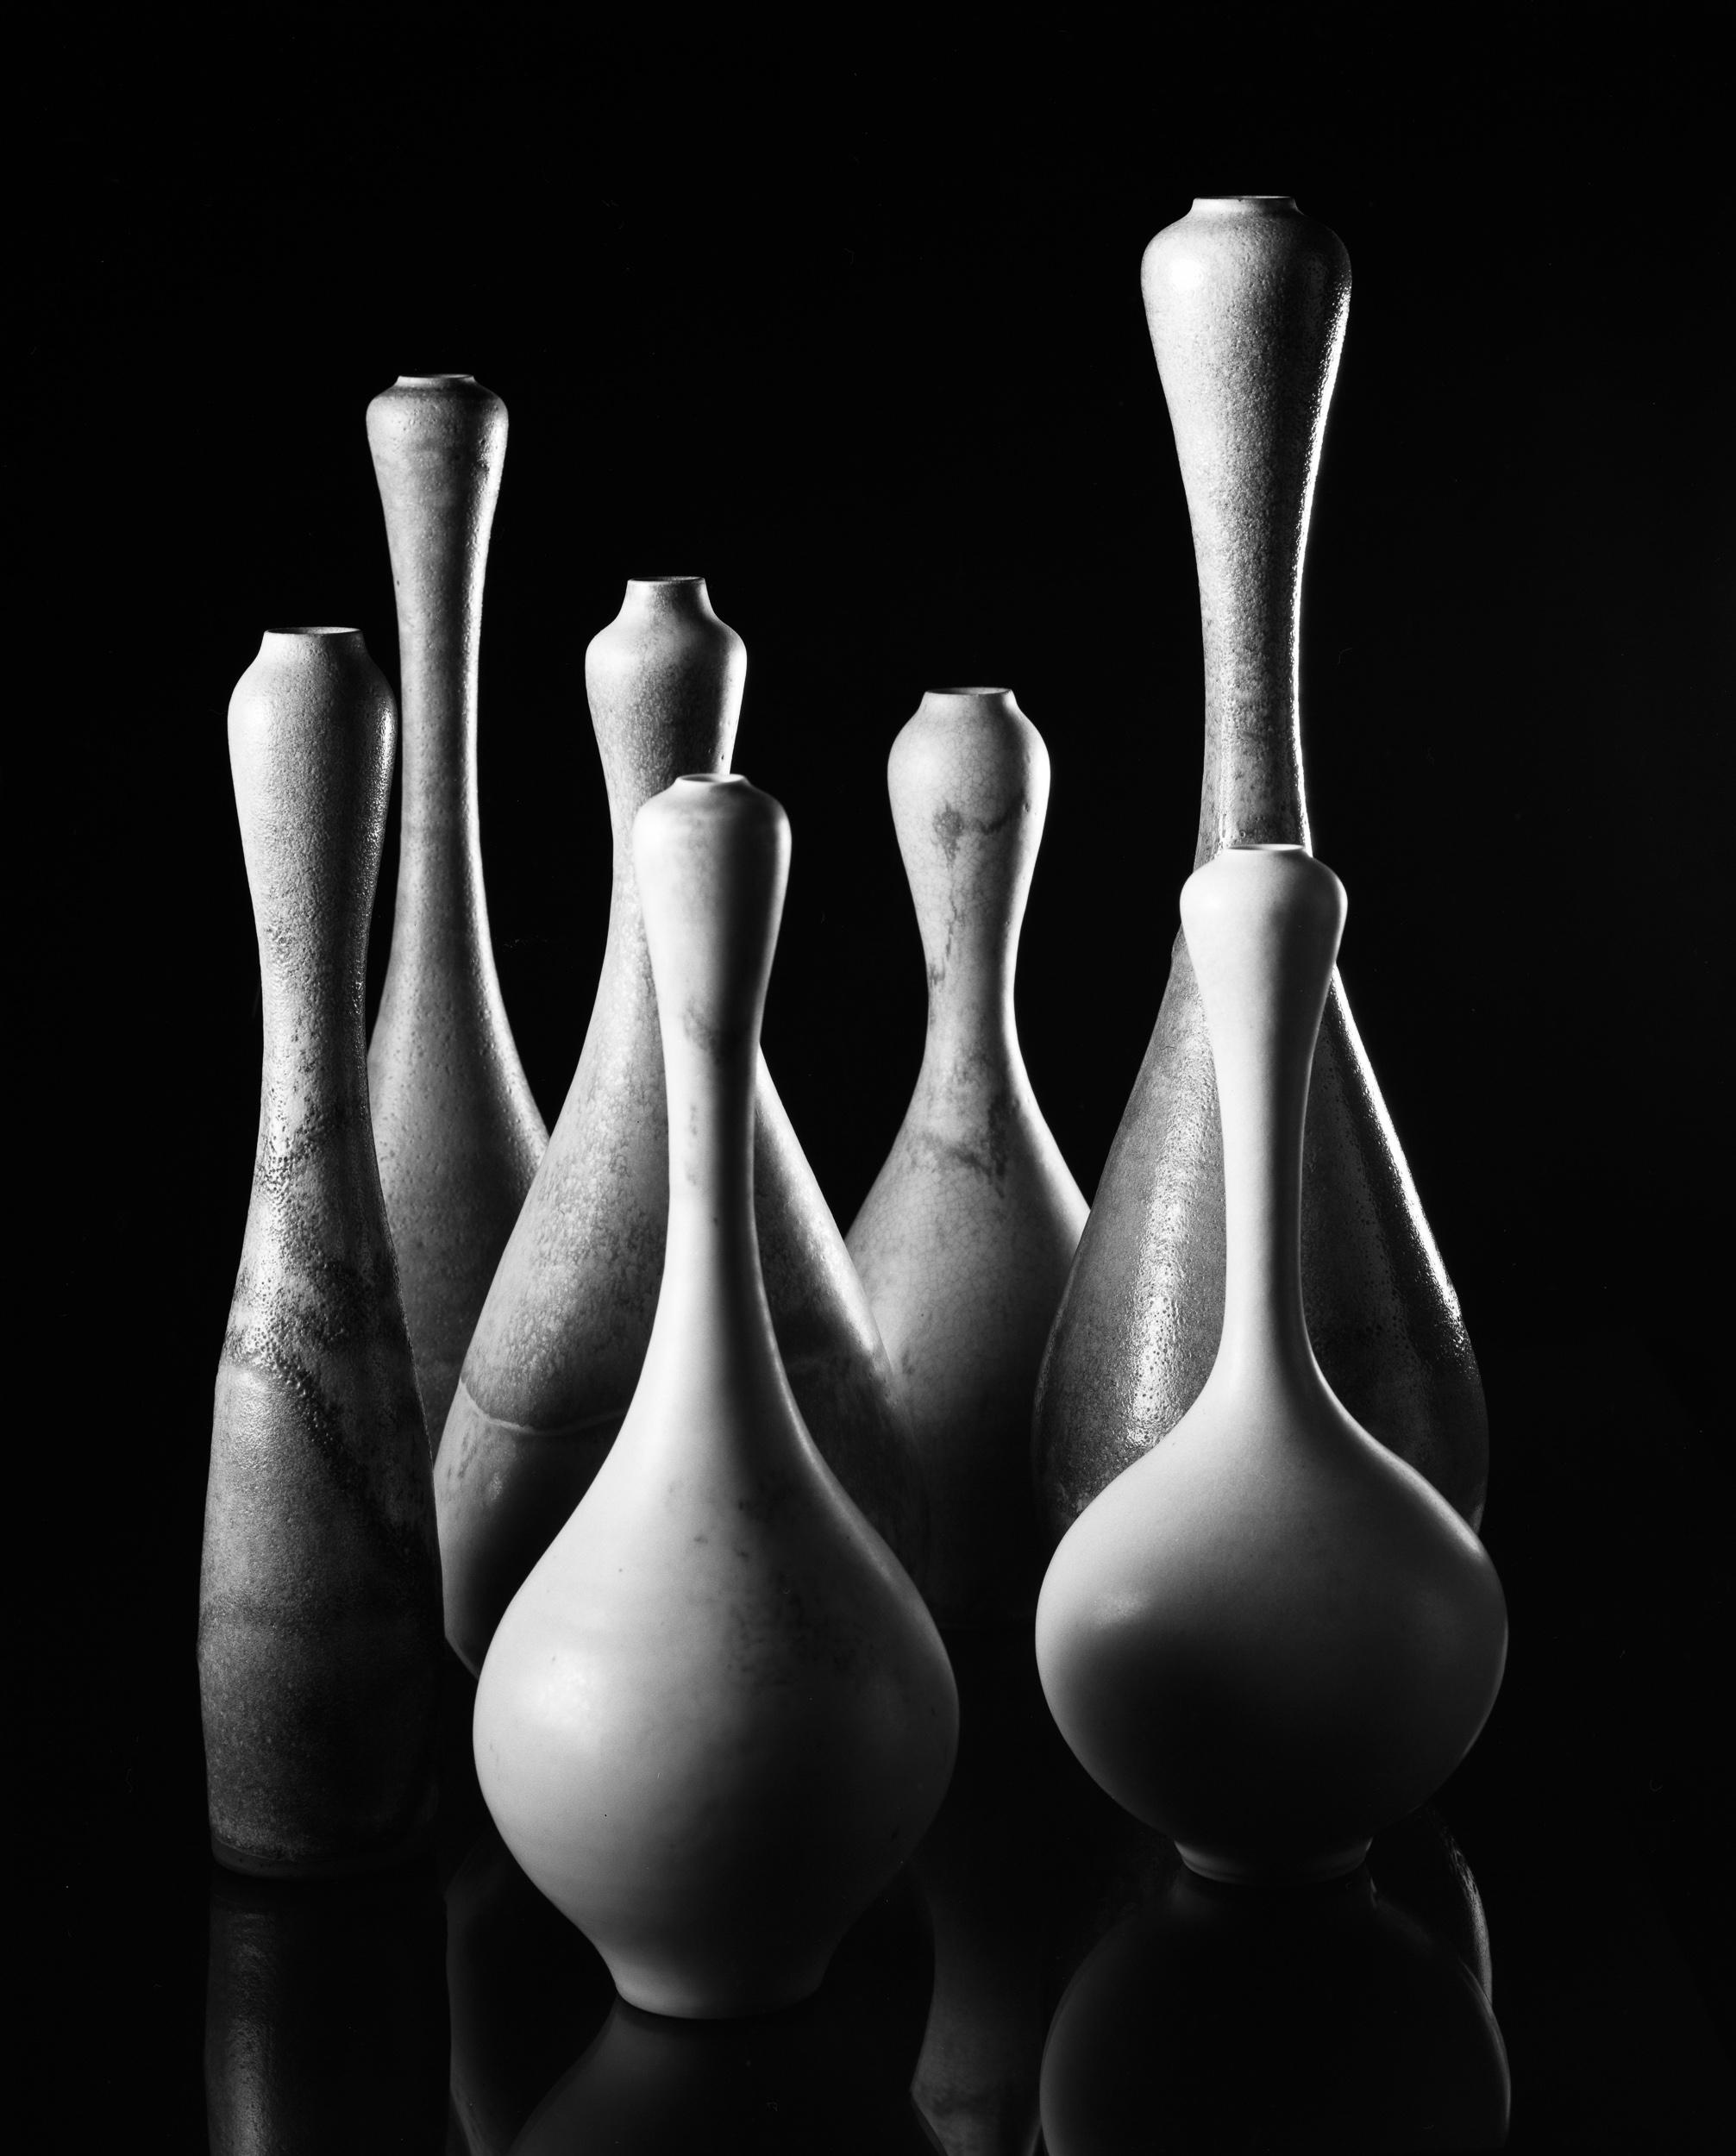 Kalebassen aus dem Keramikatelier Hohlt